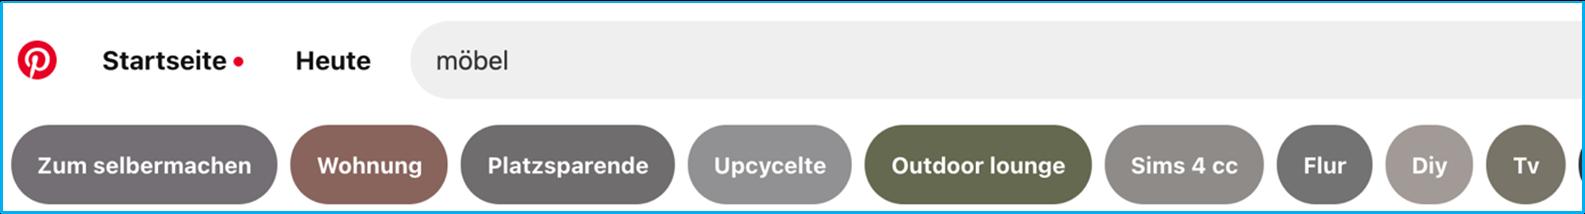 Screenshot Guided Search in der Pinterest Suche